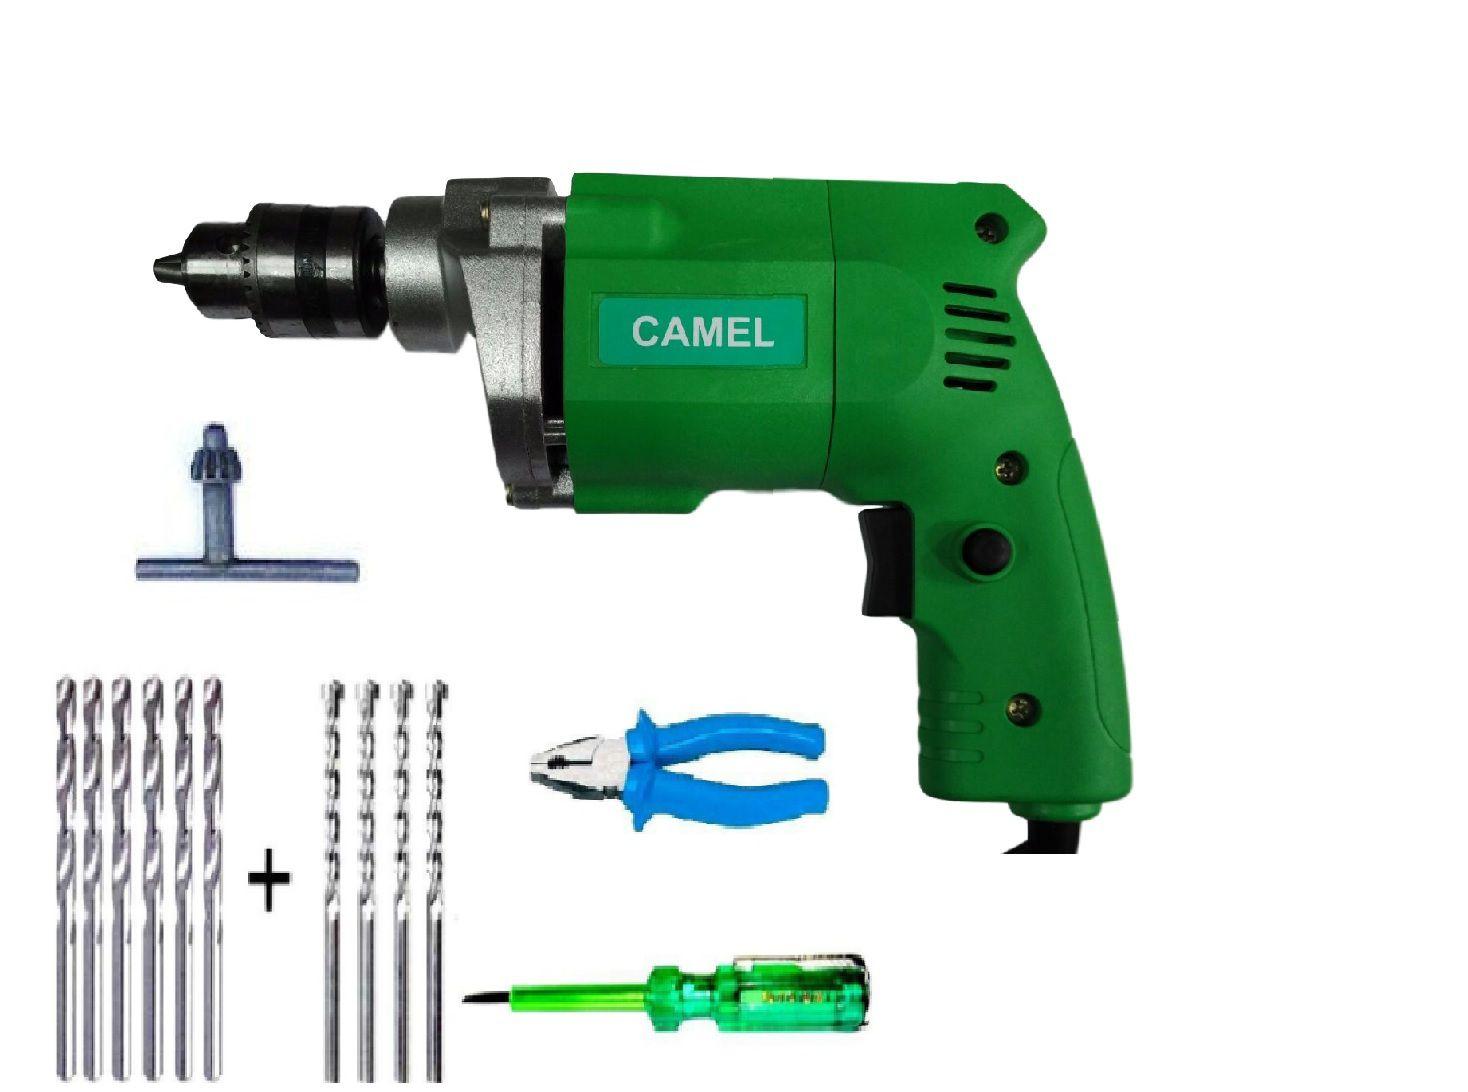 Camel 10mm 350W Drill Machine with 6 HSS + 4...